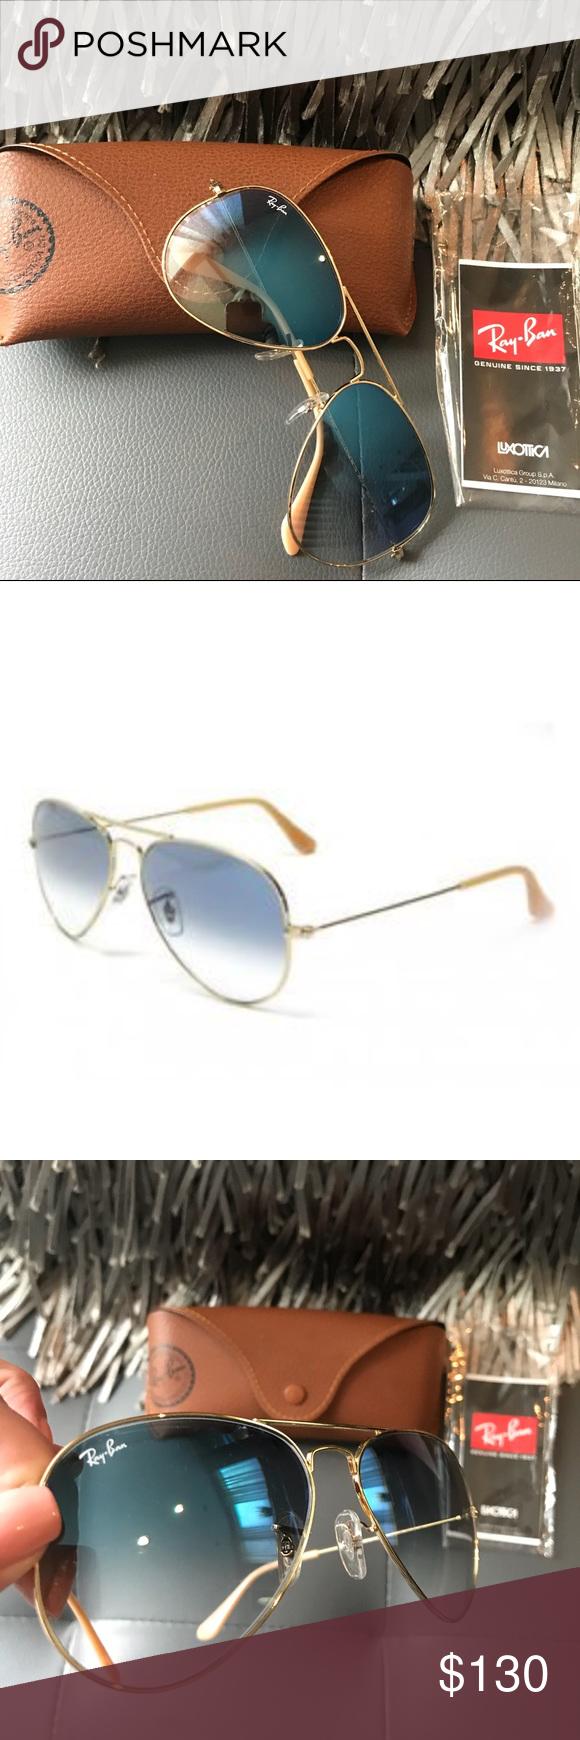 c9da1417b2 Ray-Ban- Light Blue Gradient   Gold Metal 100% UV Gorgeous light blue  gradient and gold metal